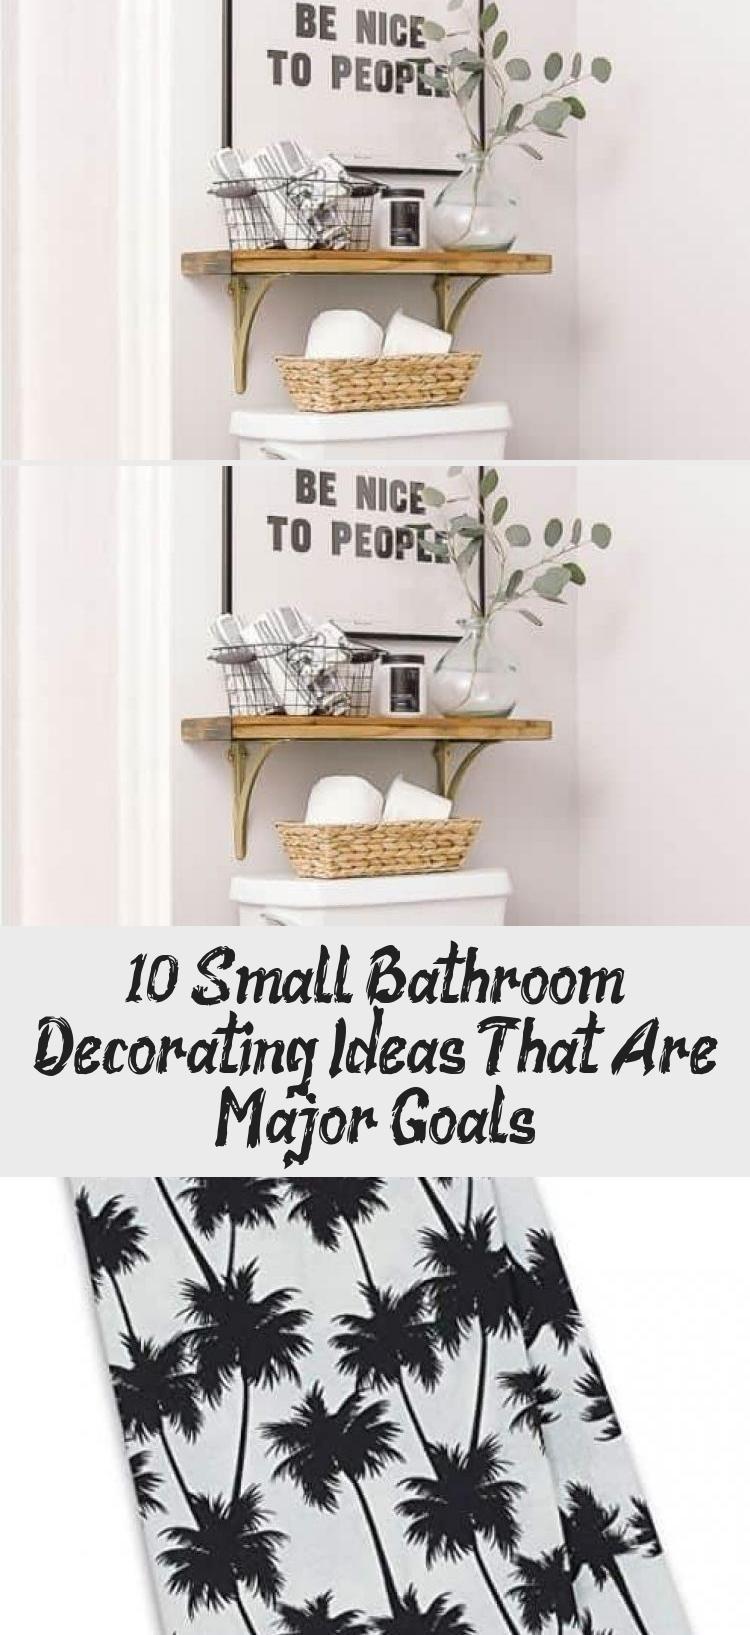 10 Small Bathroom Decorating Ideas That Are Major Goals  İdeasbathroom